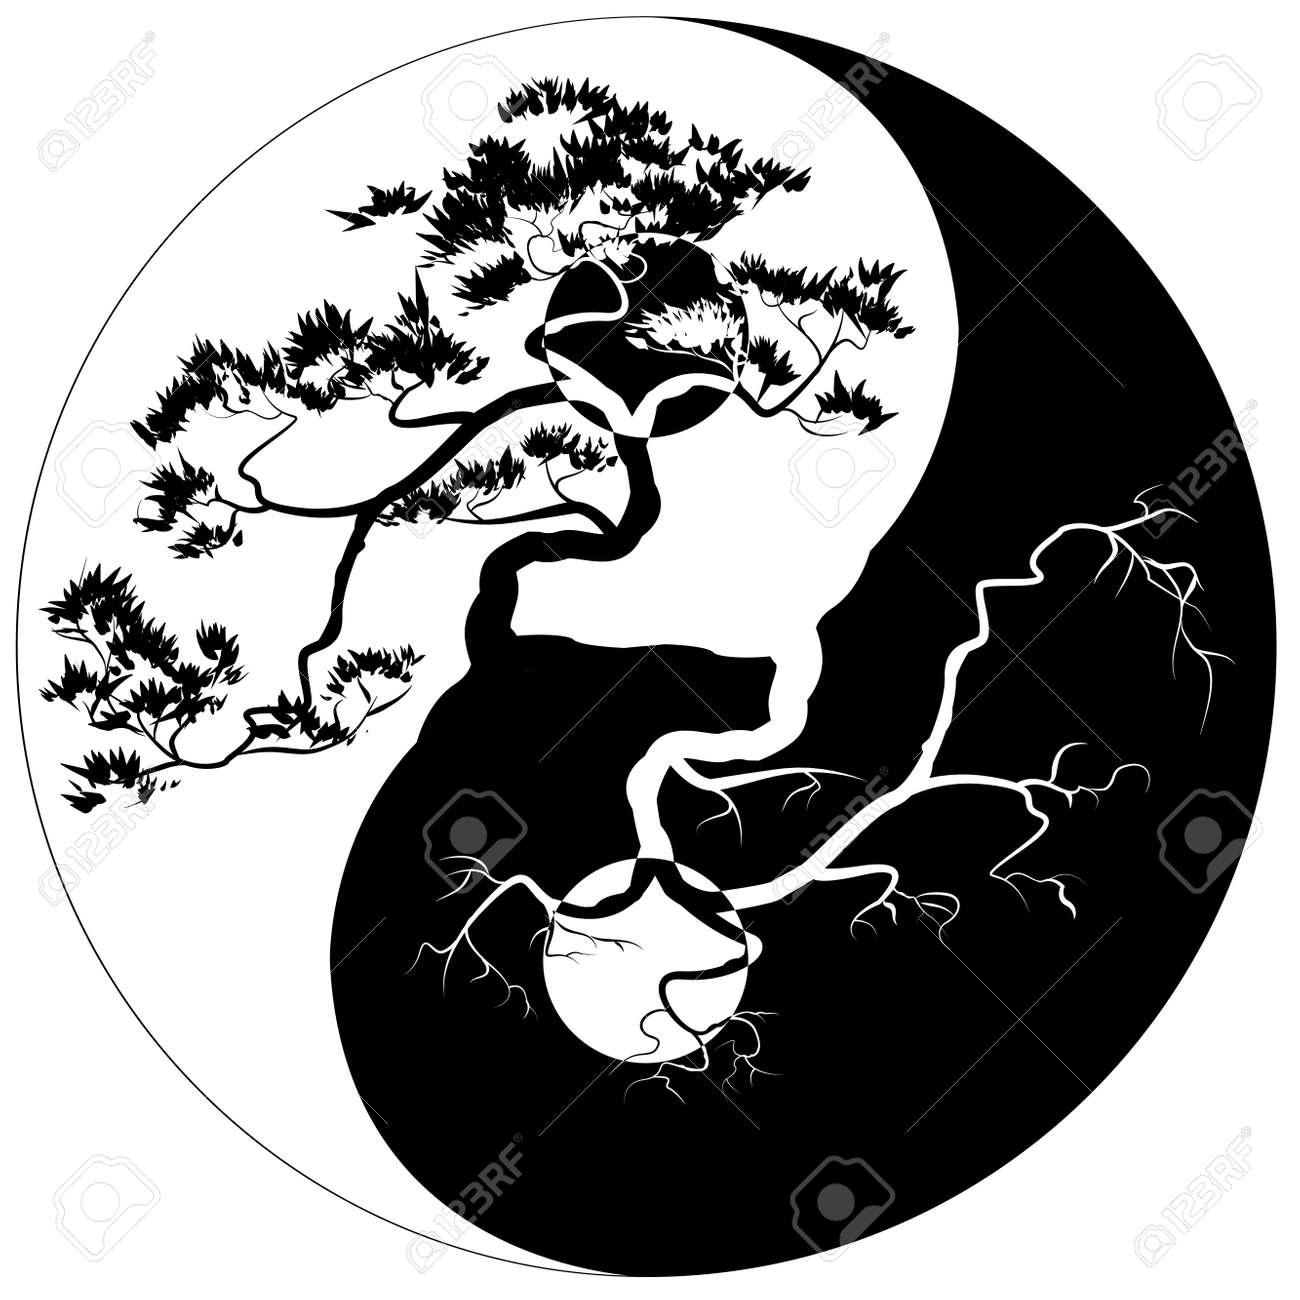 Black and white bonsai tree on the yin yang symbol royalty free black and white bonsai tree on the yin yang symbol stock vector 37392837 buycottarizona Choice Image